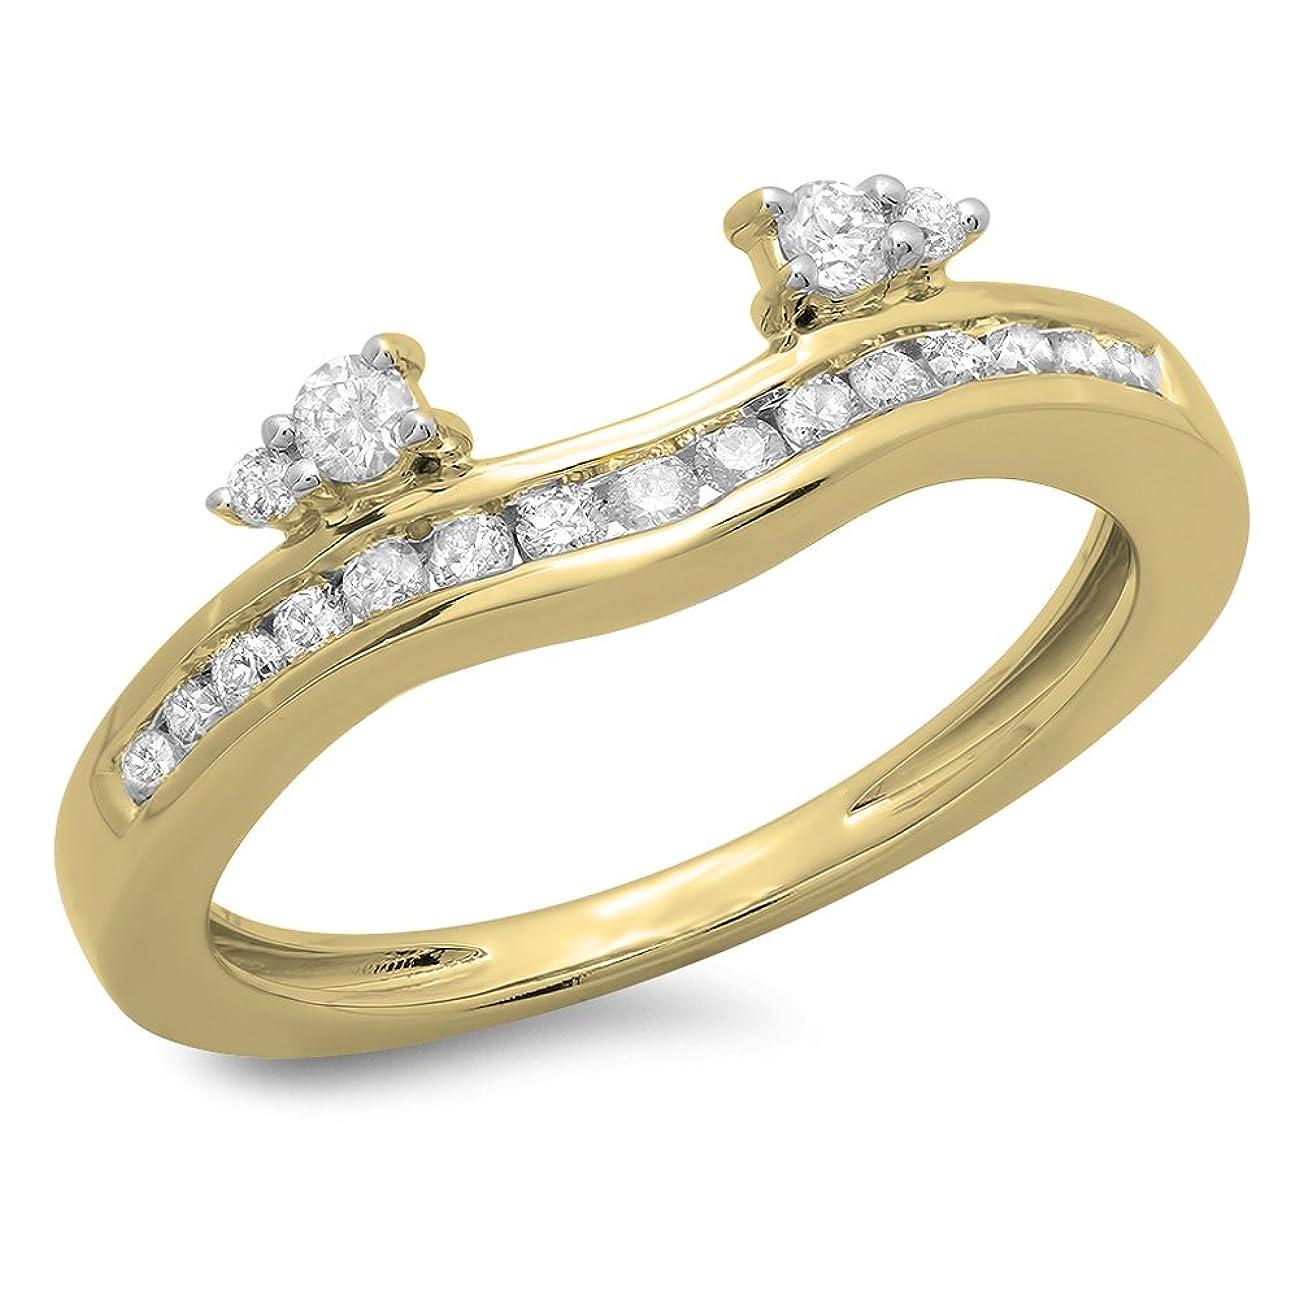 0.40 Carat (ctw) 10K Gold Diamond Ladies Anniversary Wedding Enhancer Guard Band